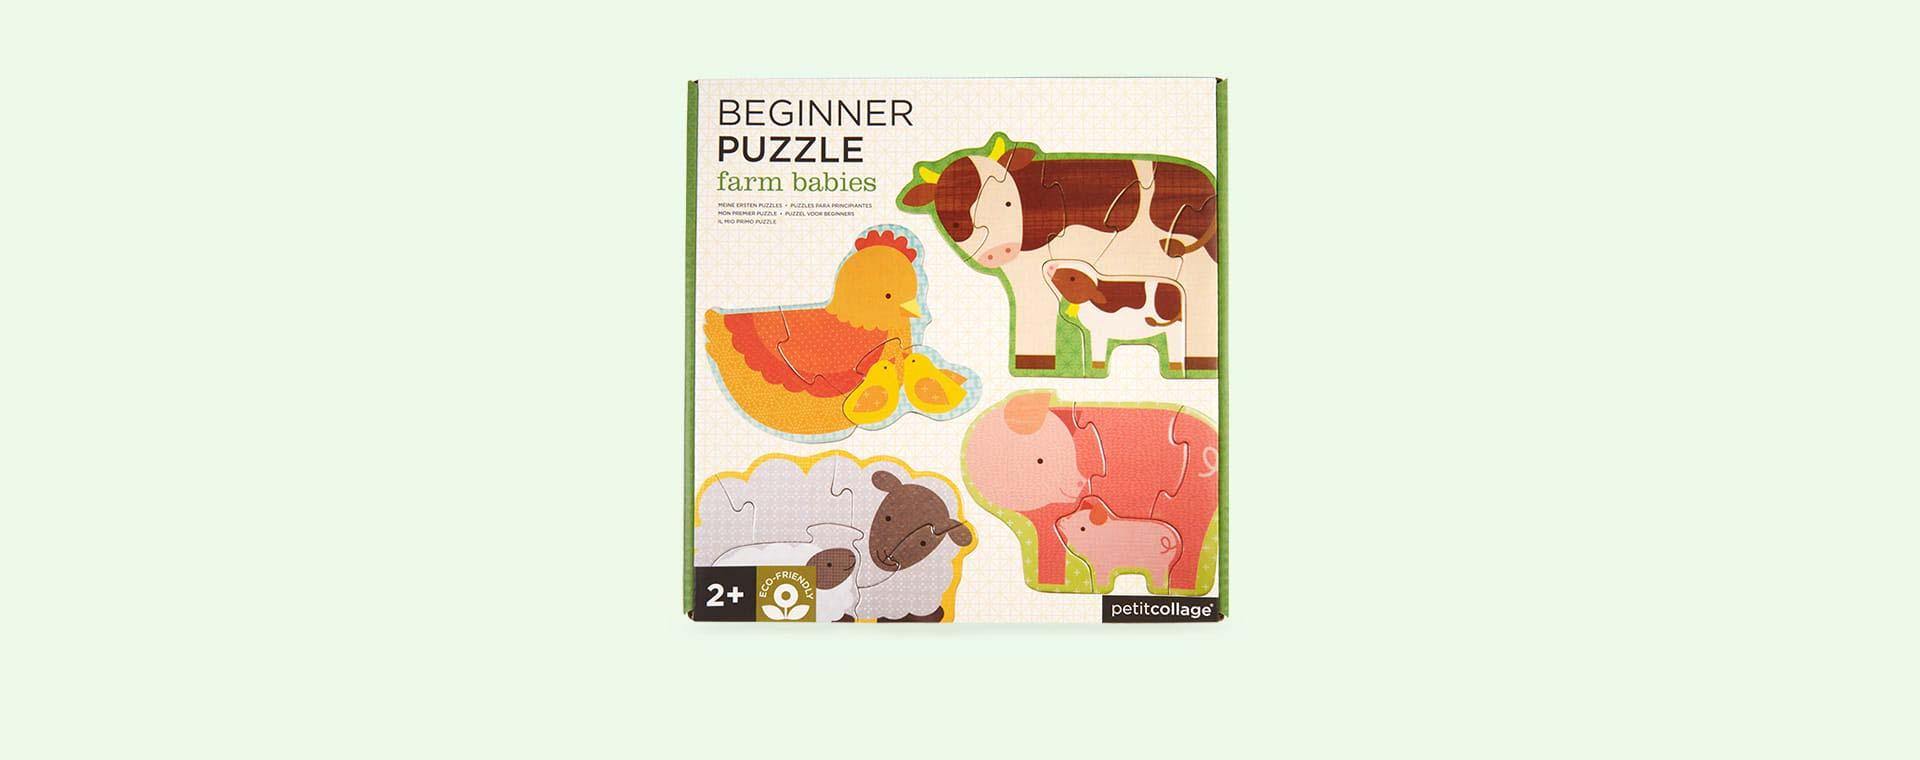 Farm Babies Petit Collage Beginner Puzzle